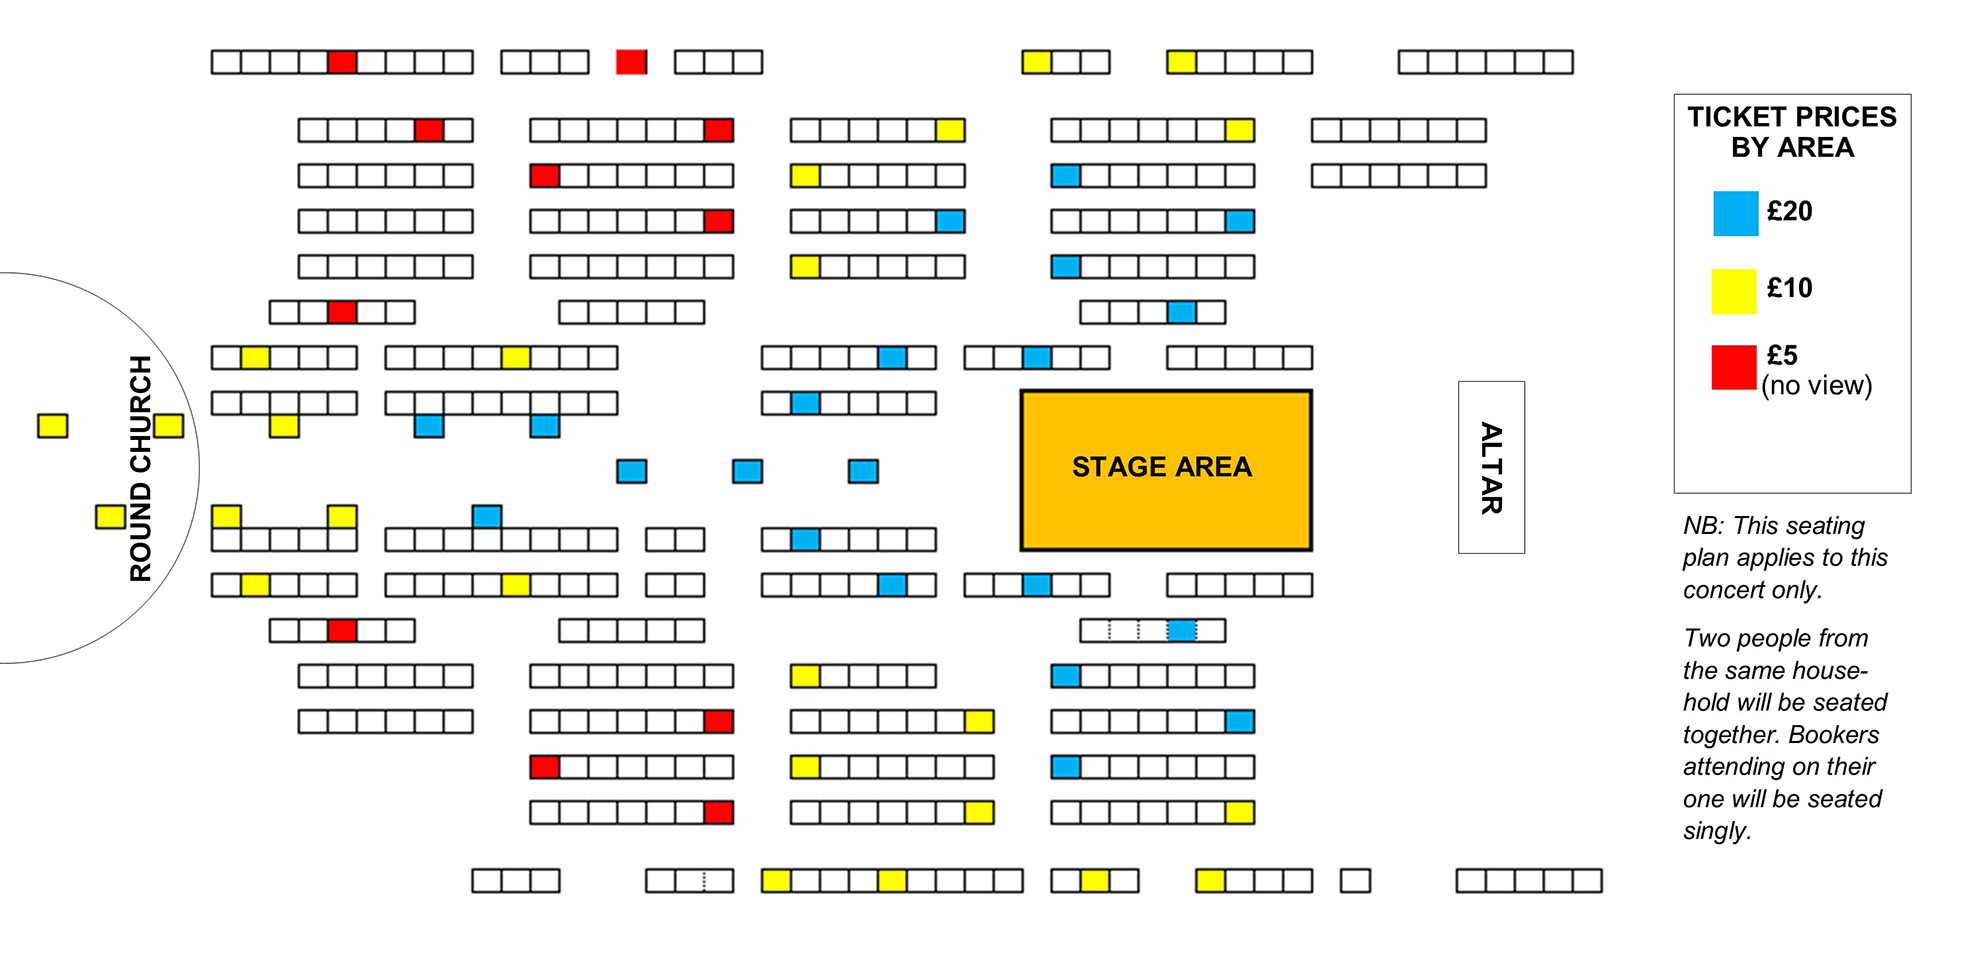 Seating plan A concert curated by John Ashton Thomas - POSTPONED